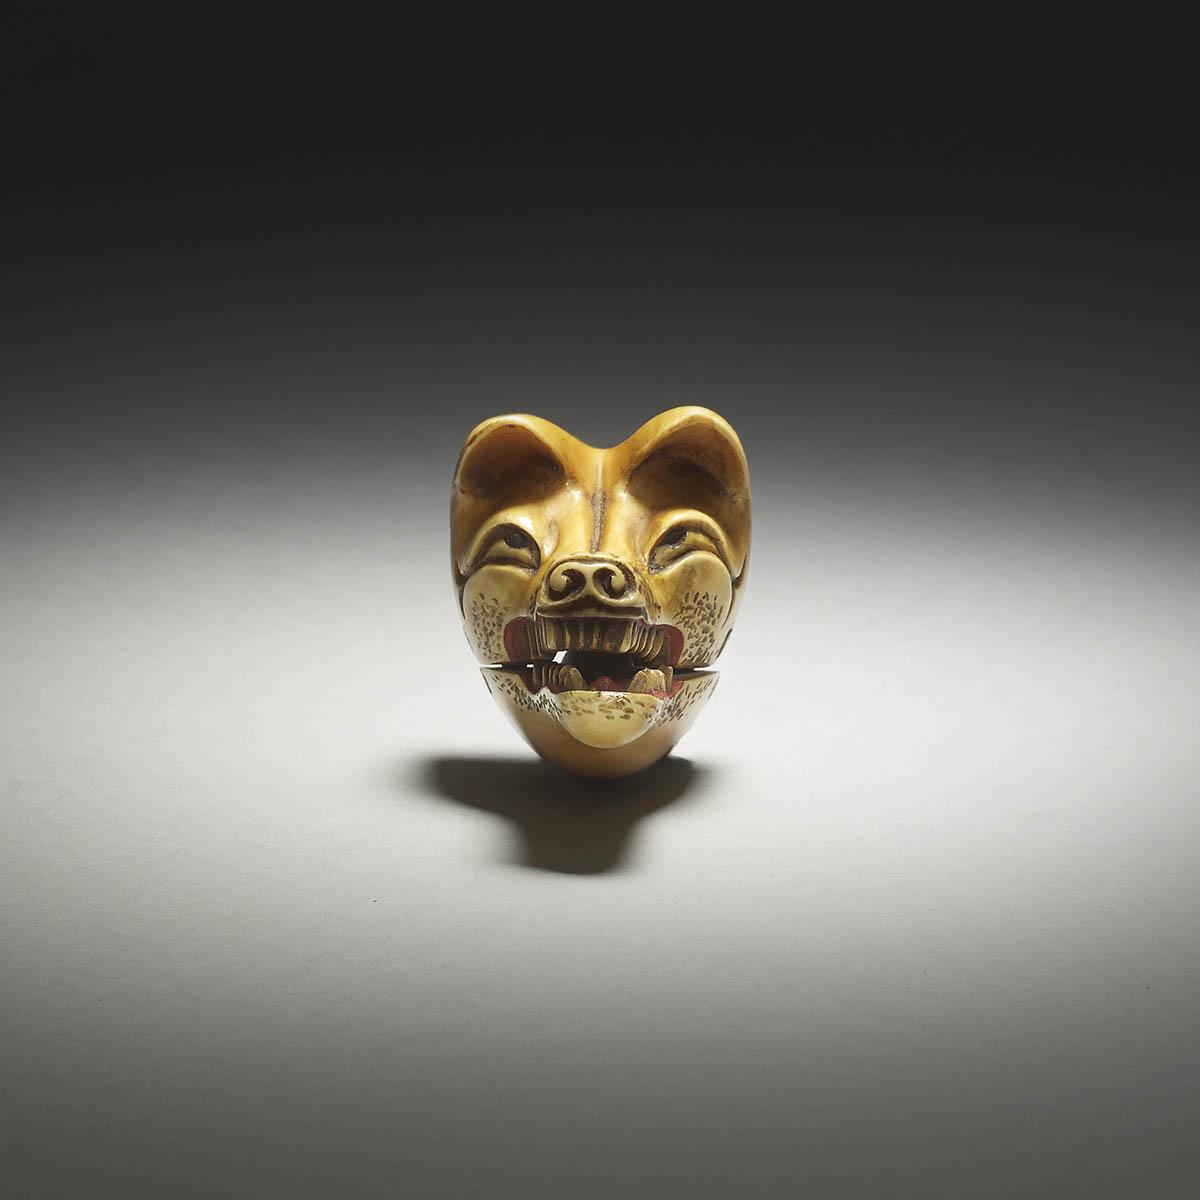 Deme Uman ivory kistune mask netsuke, MR2499_v1